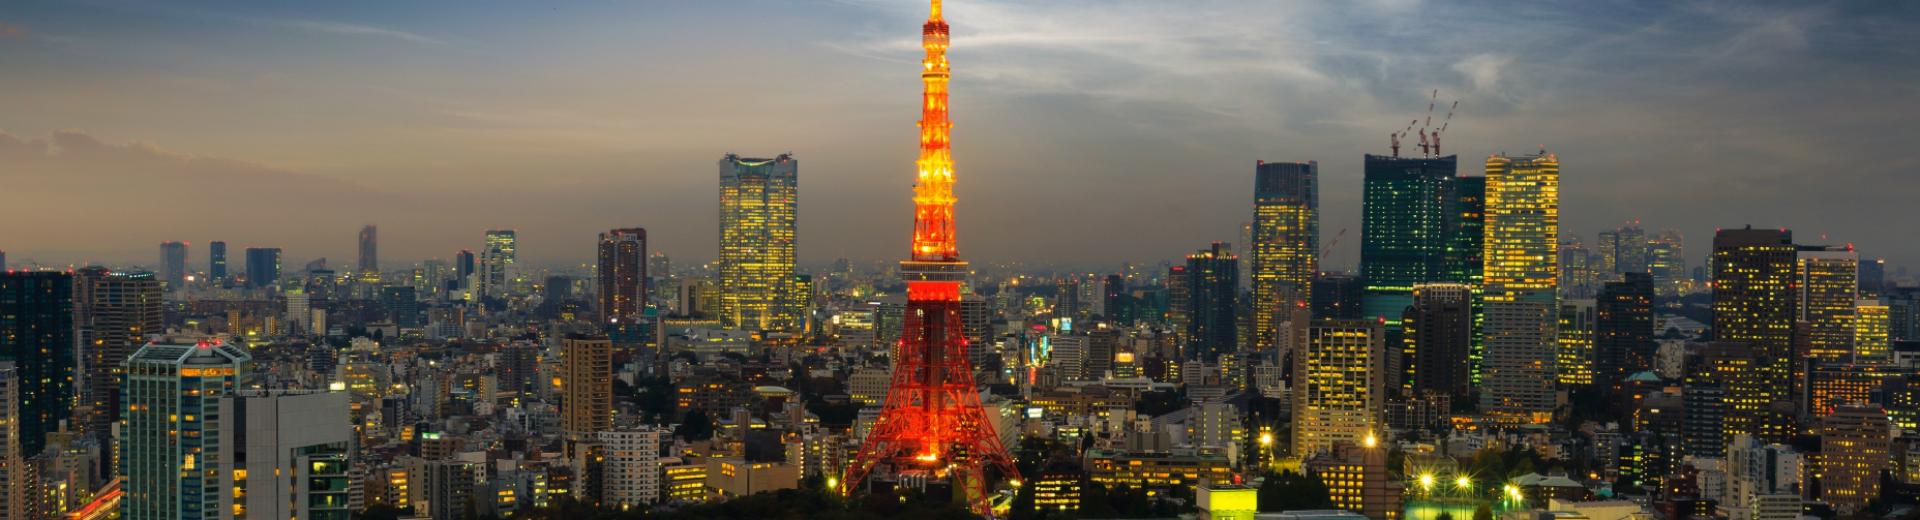 Tokyo skyline. Copyright: Shutterstock / Krunja